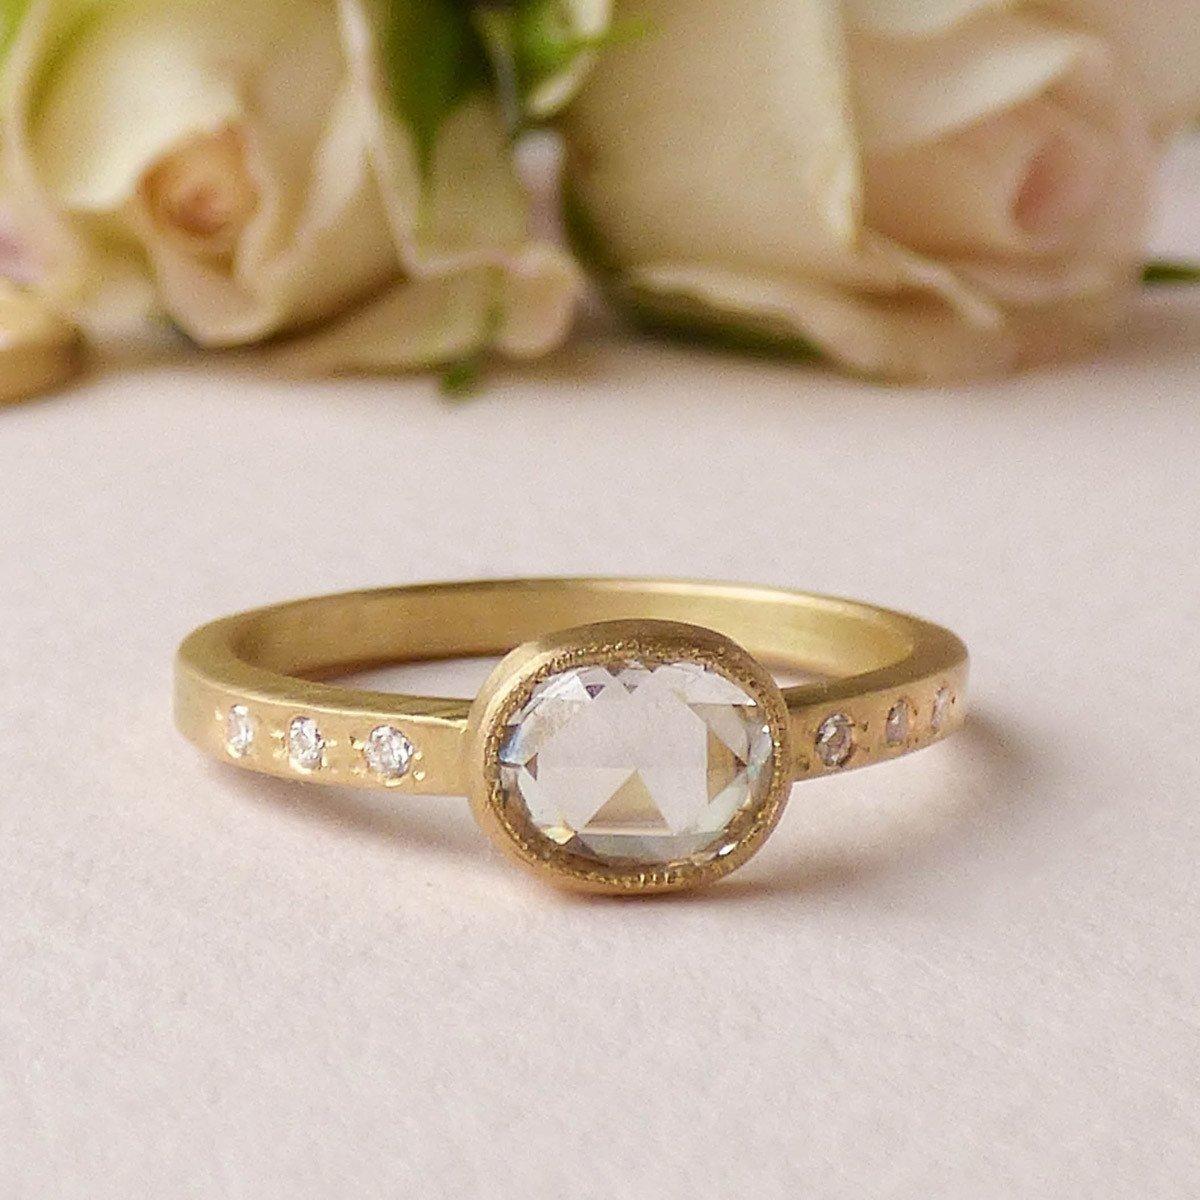 18kt Fairtrade Gold Iris Diamond Ring